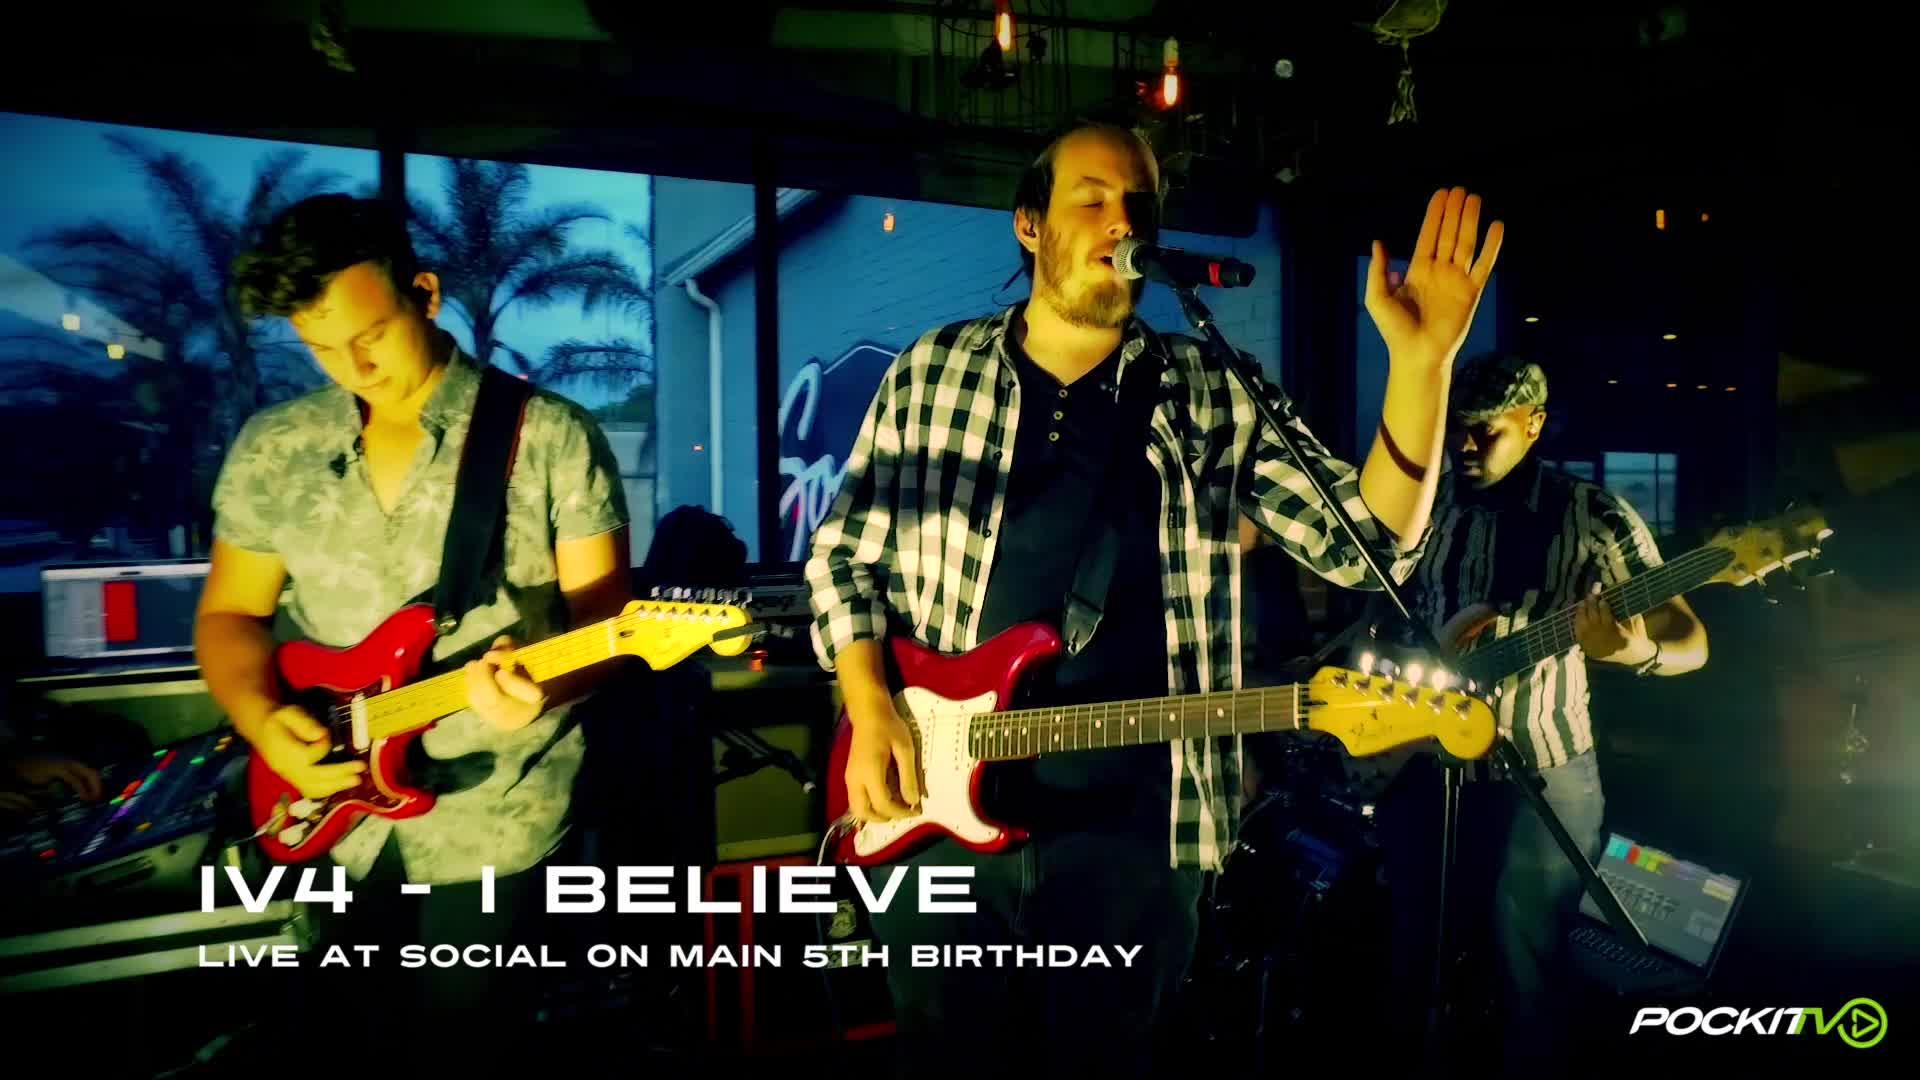 IV4 - I believe